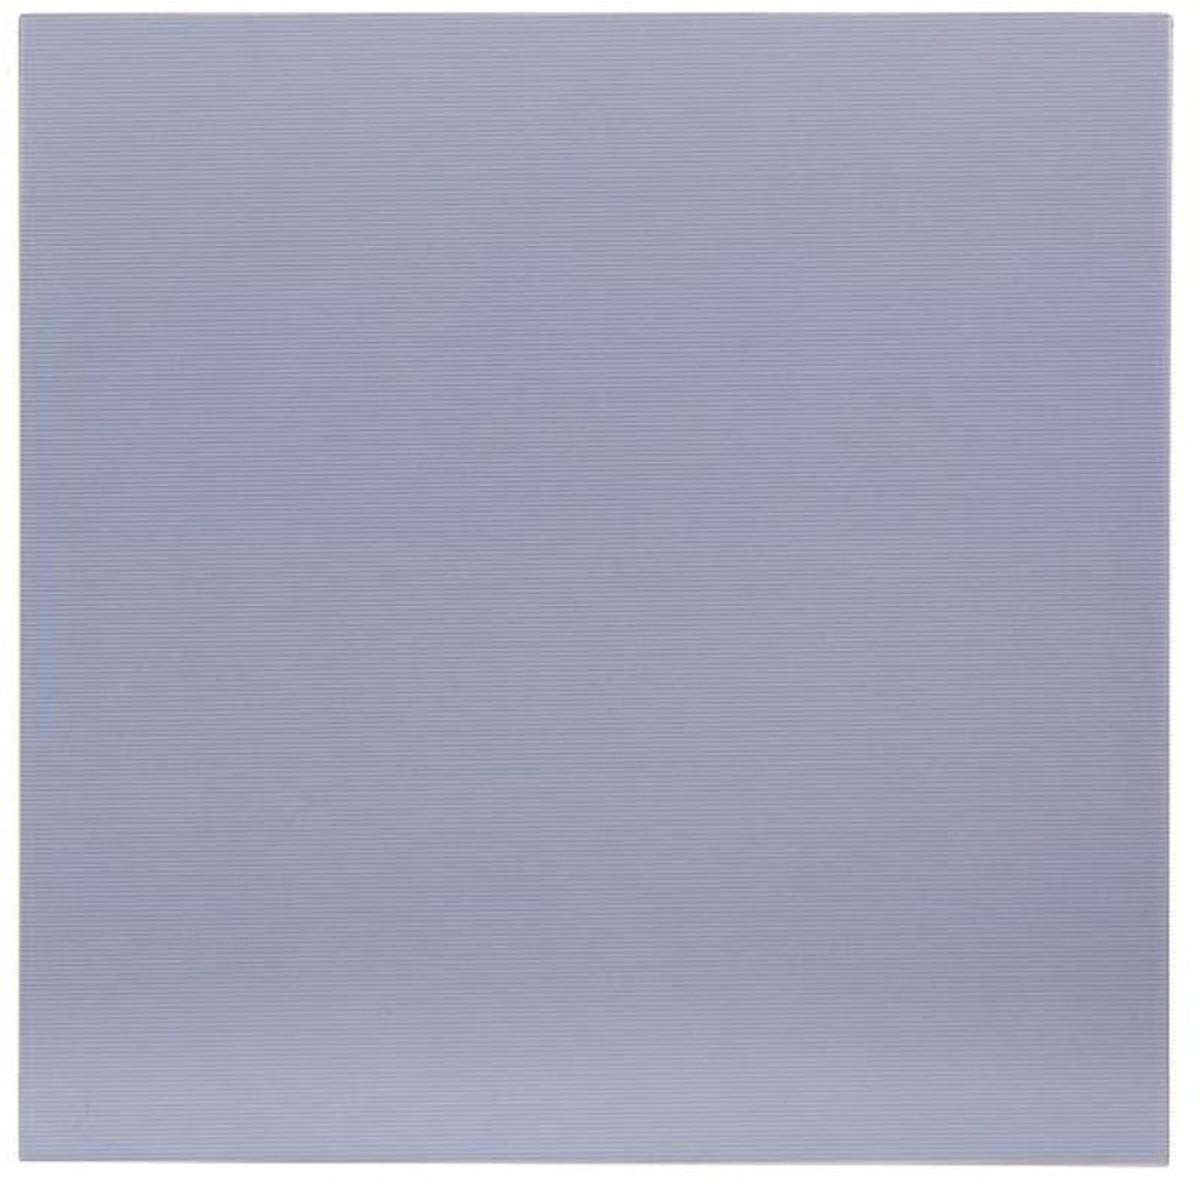 Плитка настенная Фэнтази цвет серый 25x50 см 1 м2